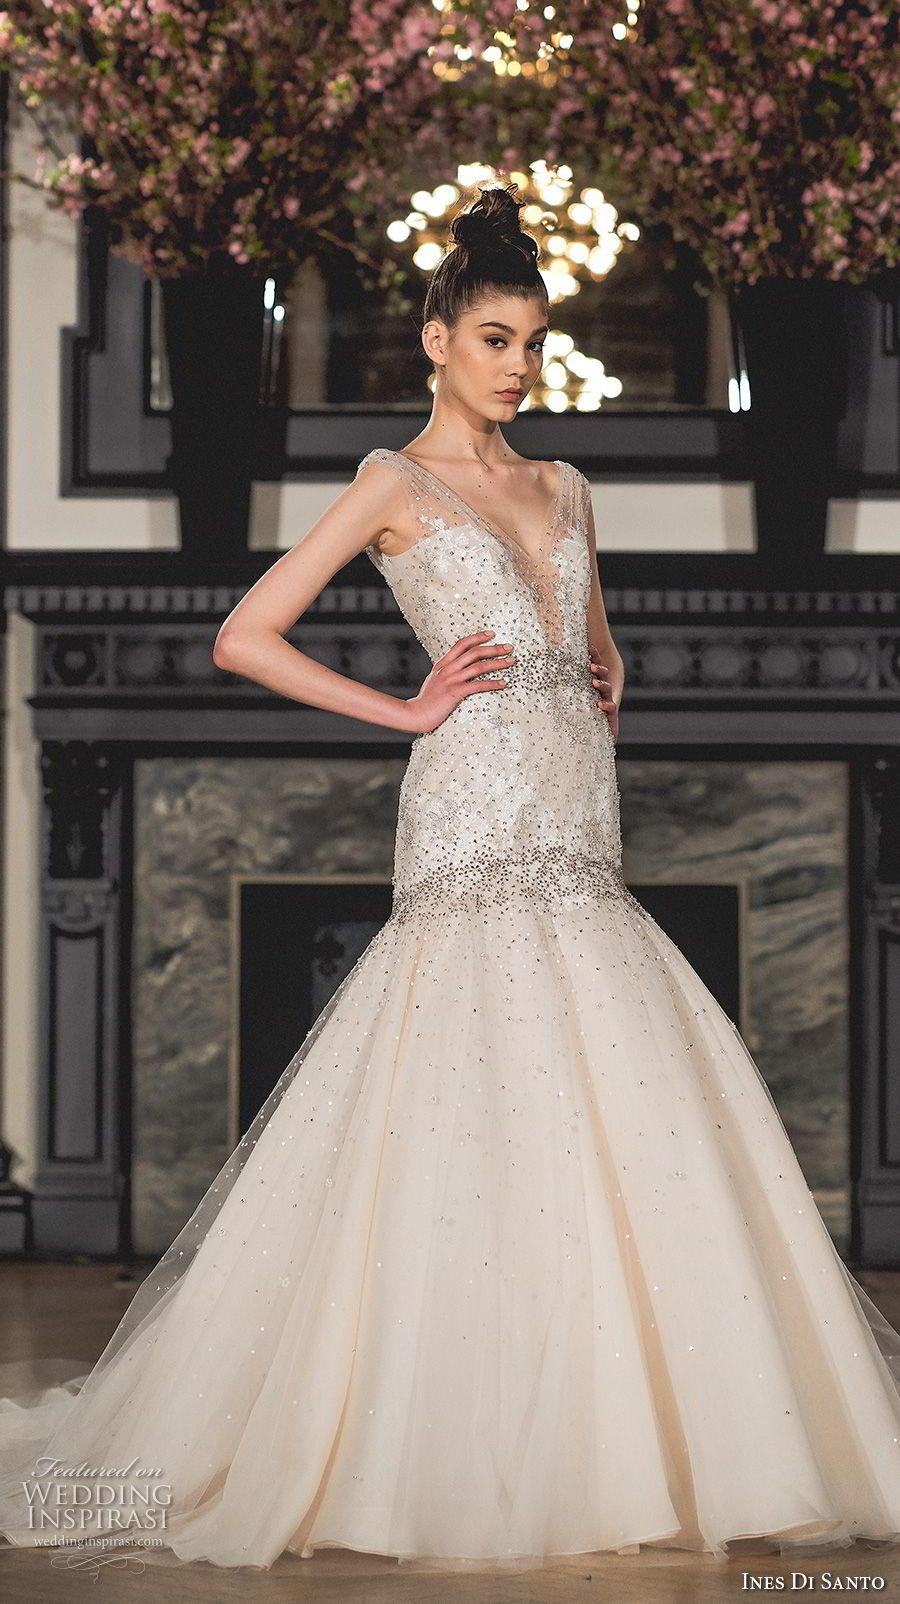 Ines di santo spring wedding dresses u ucmodern romanceud bridal